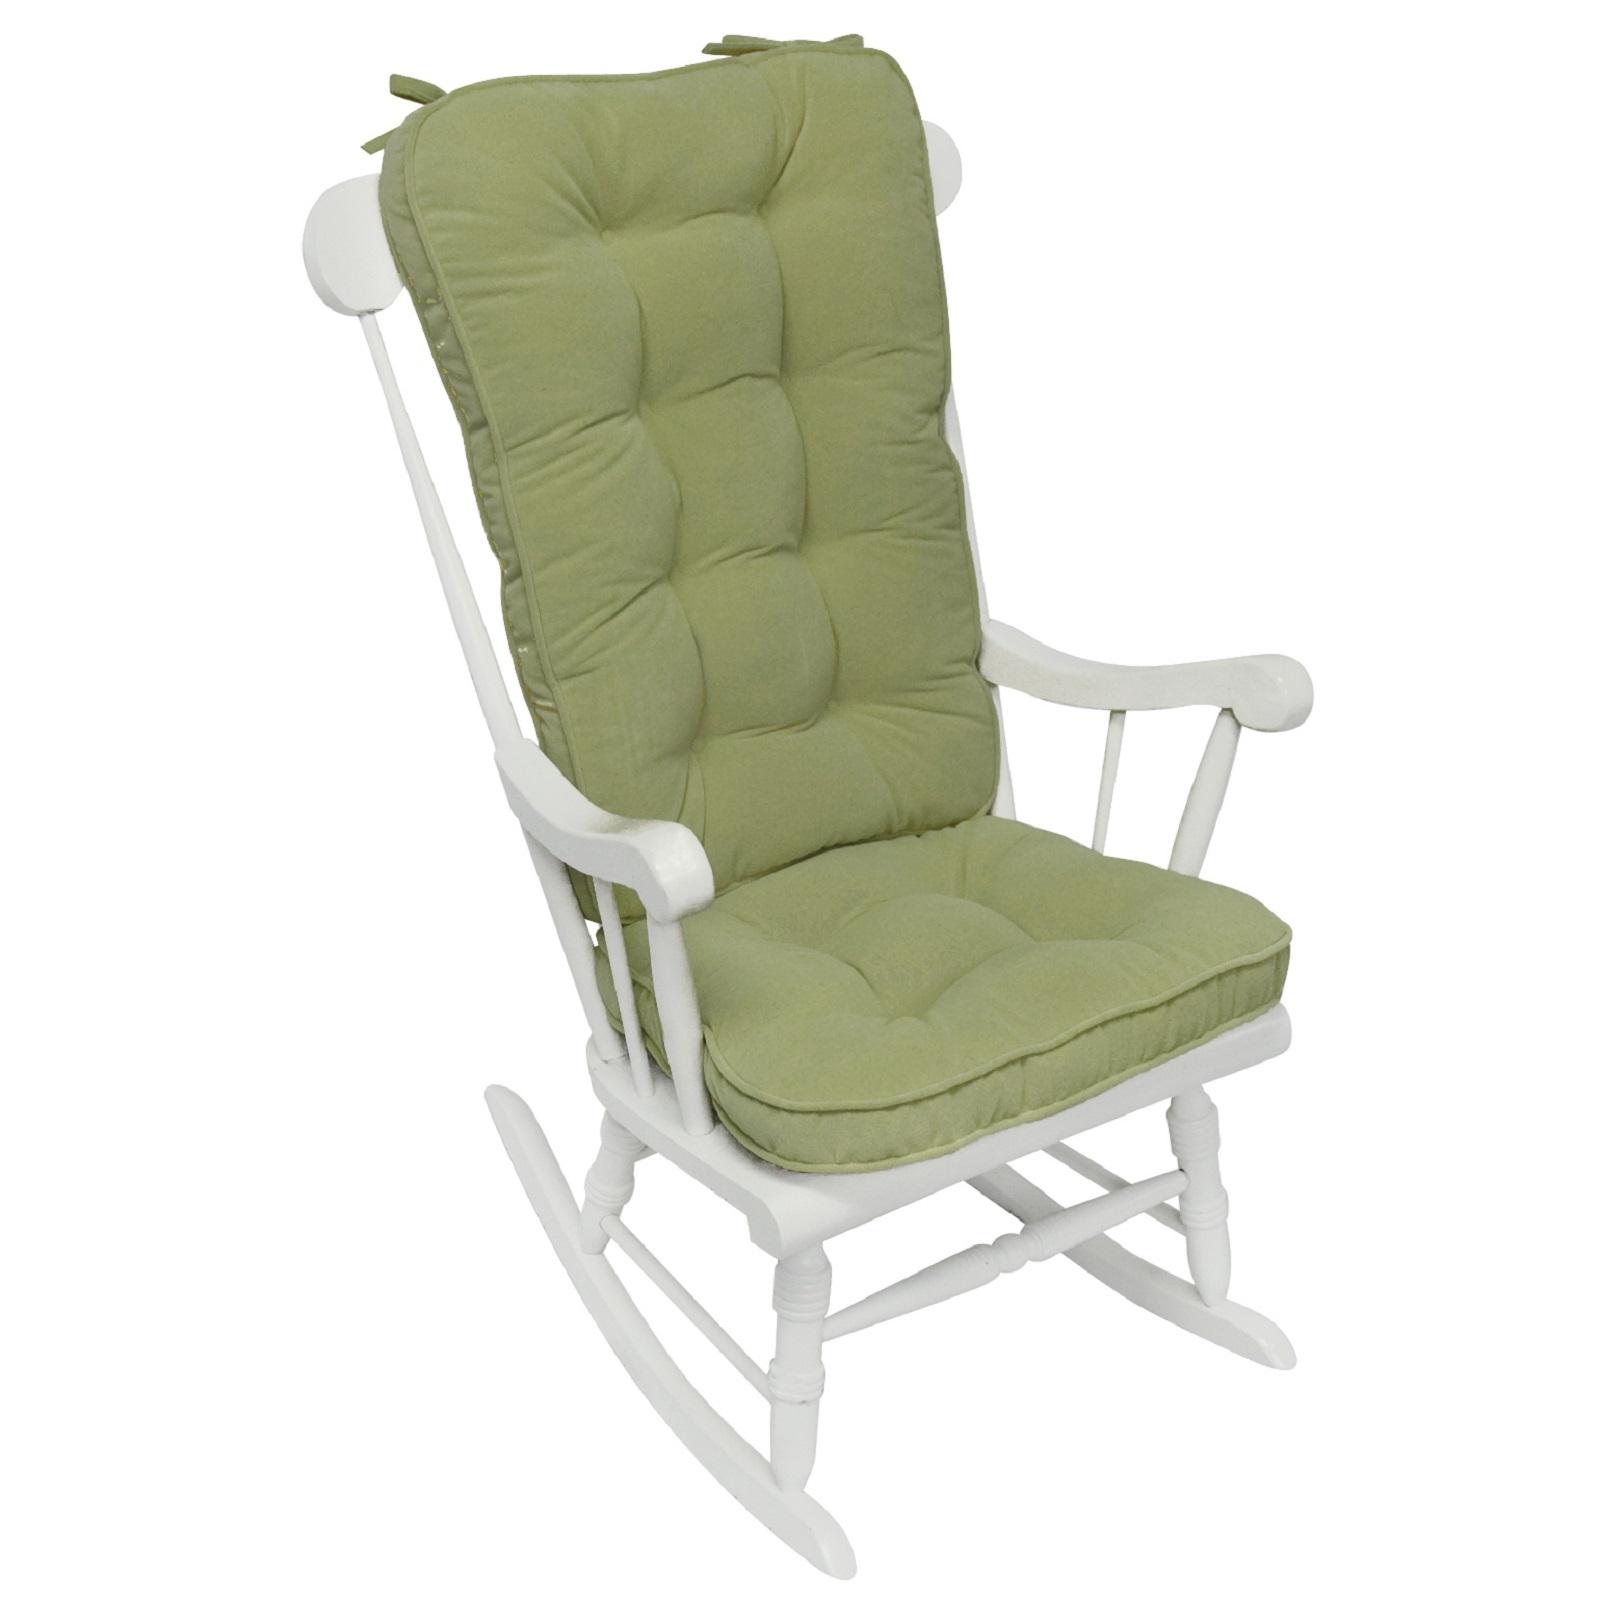 Greendale Home Fashions Hyatt Jumbo Rocking Chair Cushion Set Moss Home